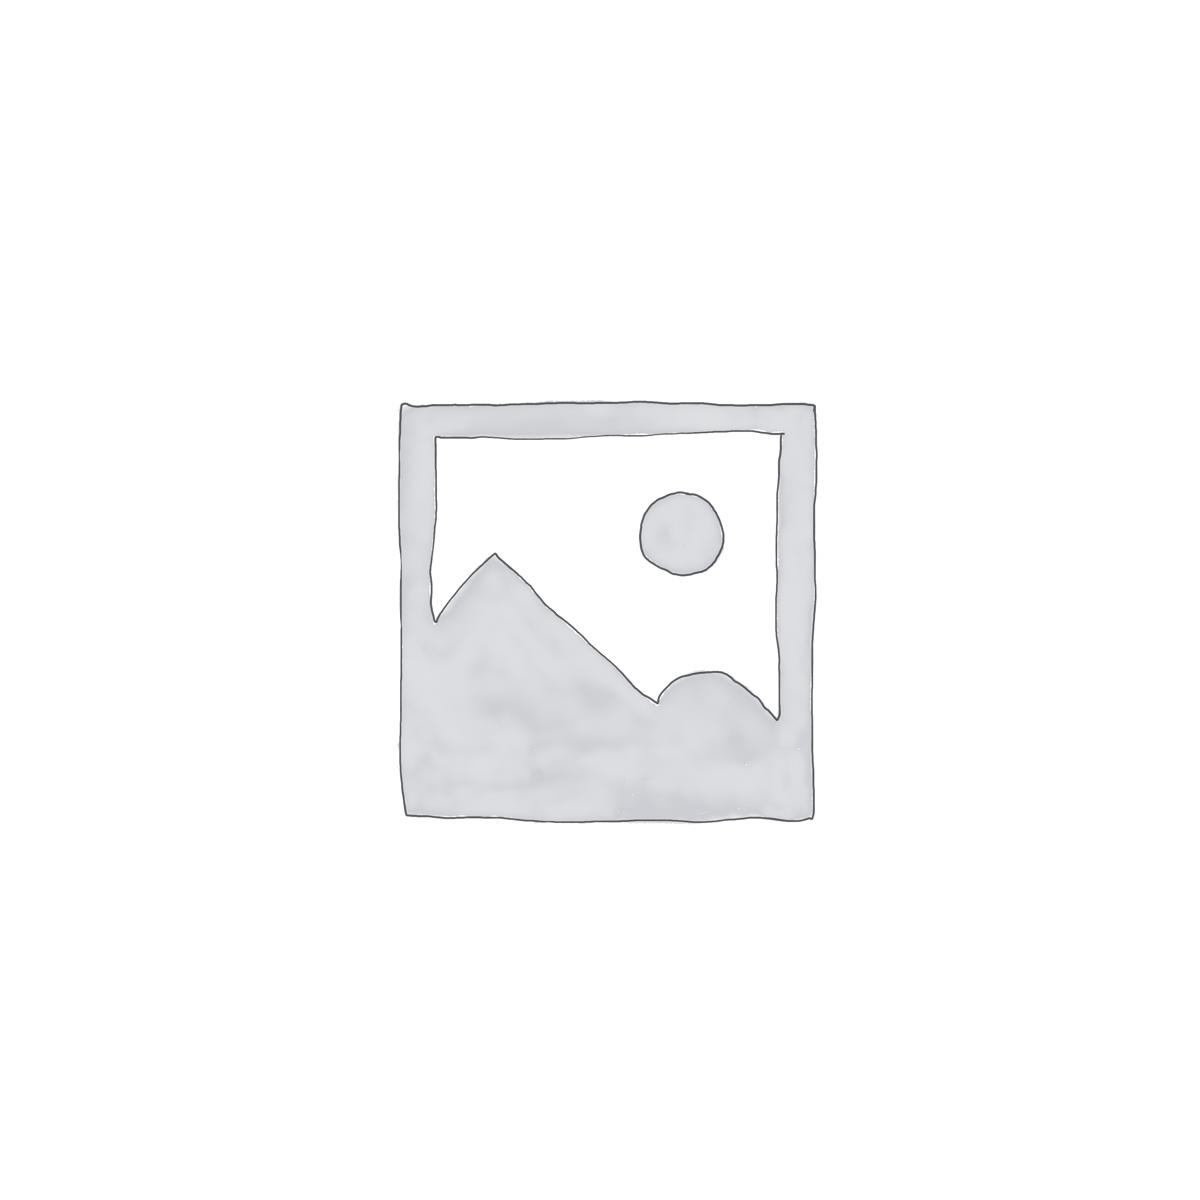 Boho Geometric Abstract Art Wallpaper Mural